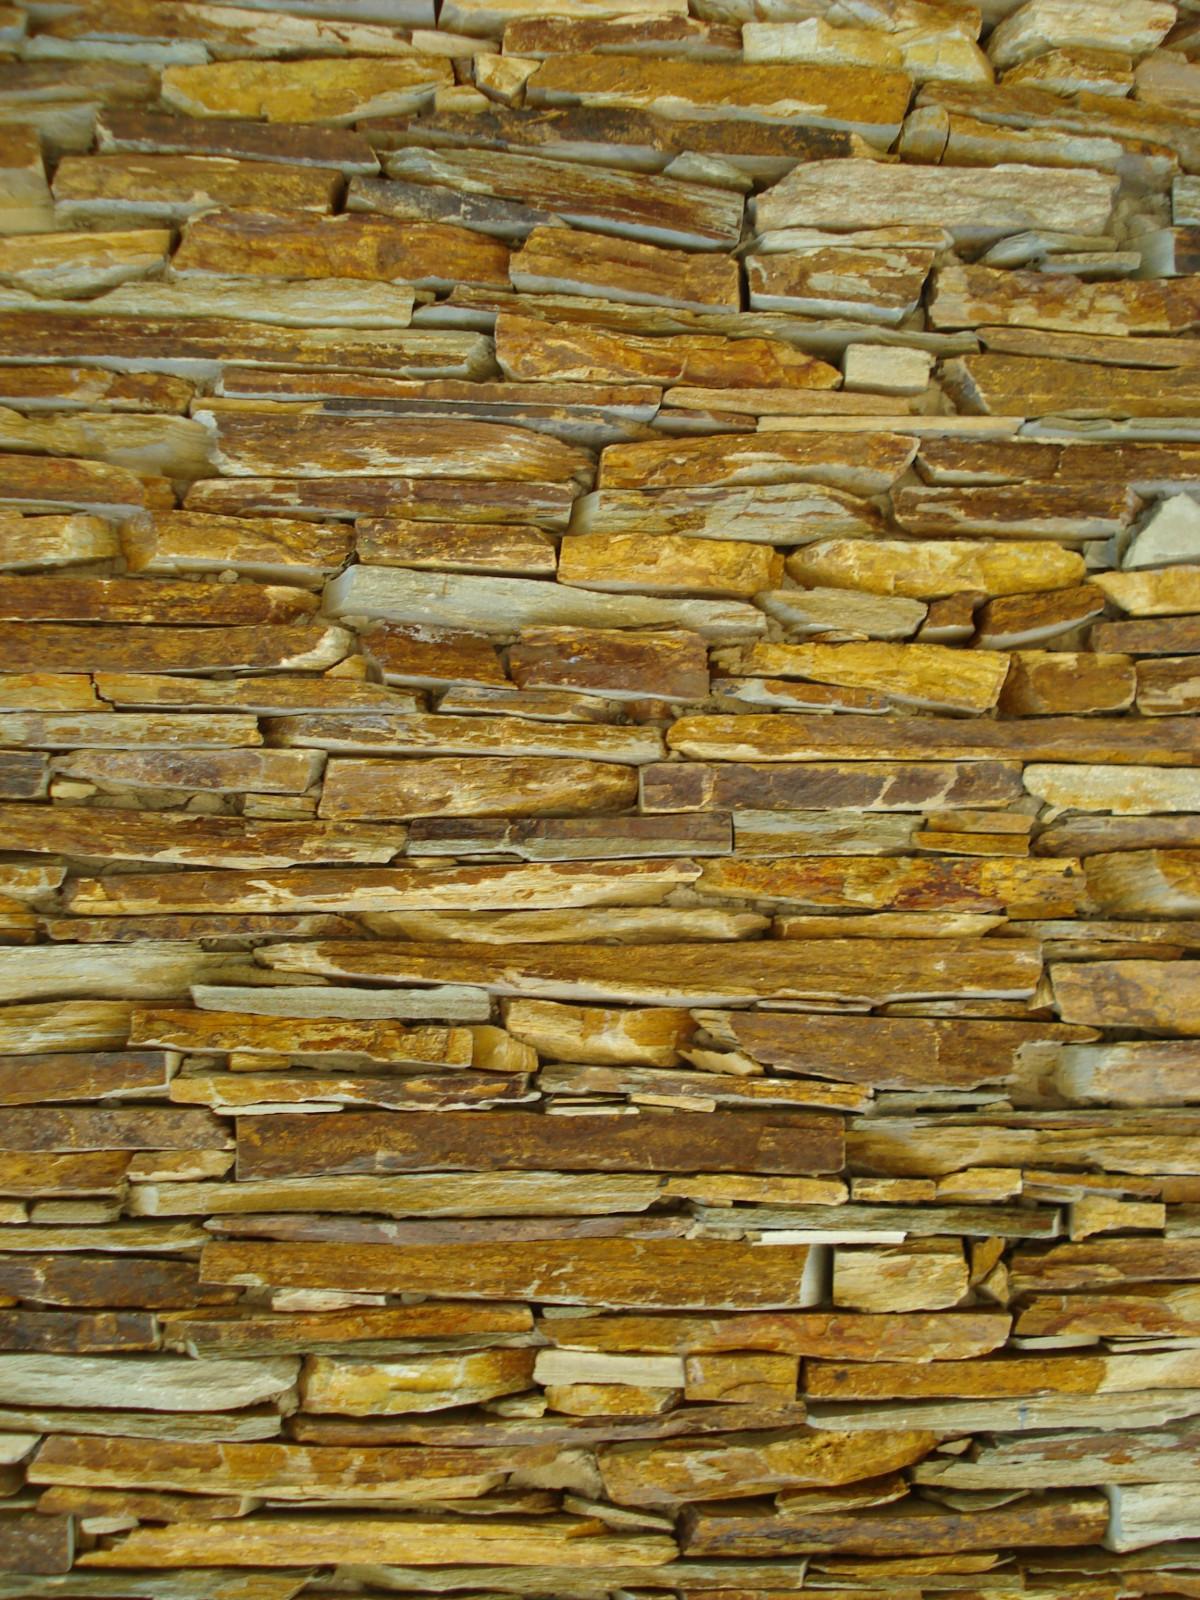 Free Images : rock, wood, floor, building, soil, stone wall, brick ...